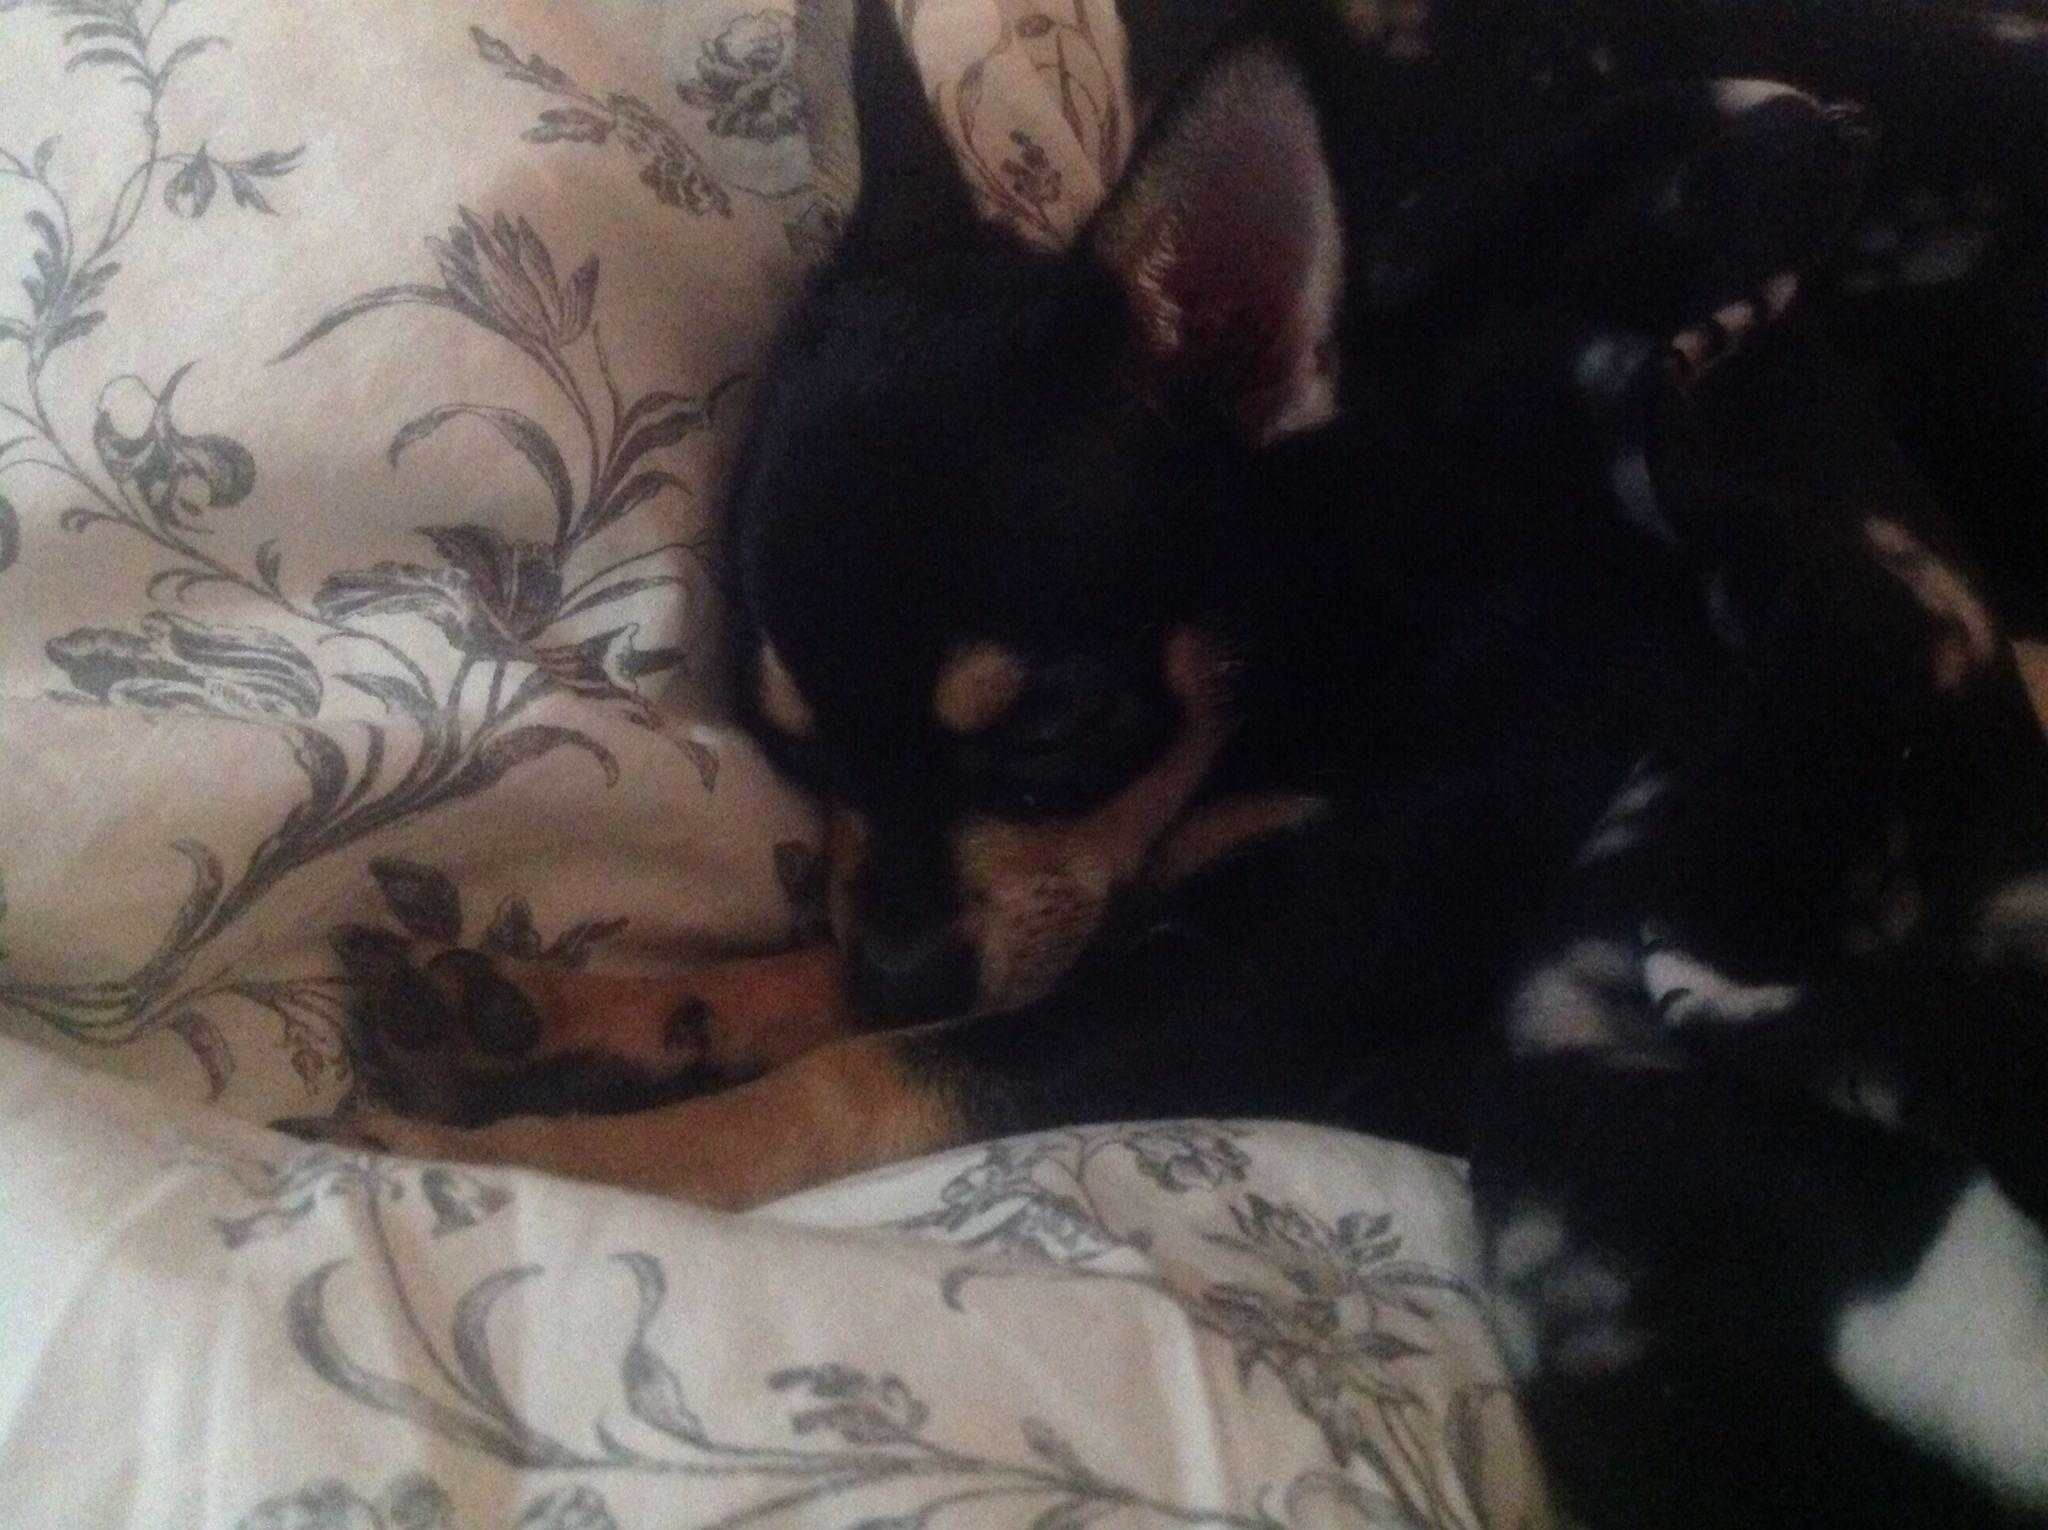 Baby Chihuahua X Baby Chihuahua Chihuahua Puppies Chihuahua